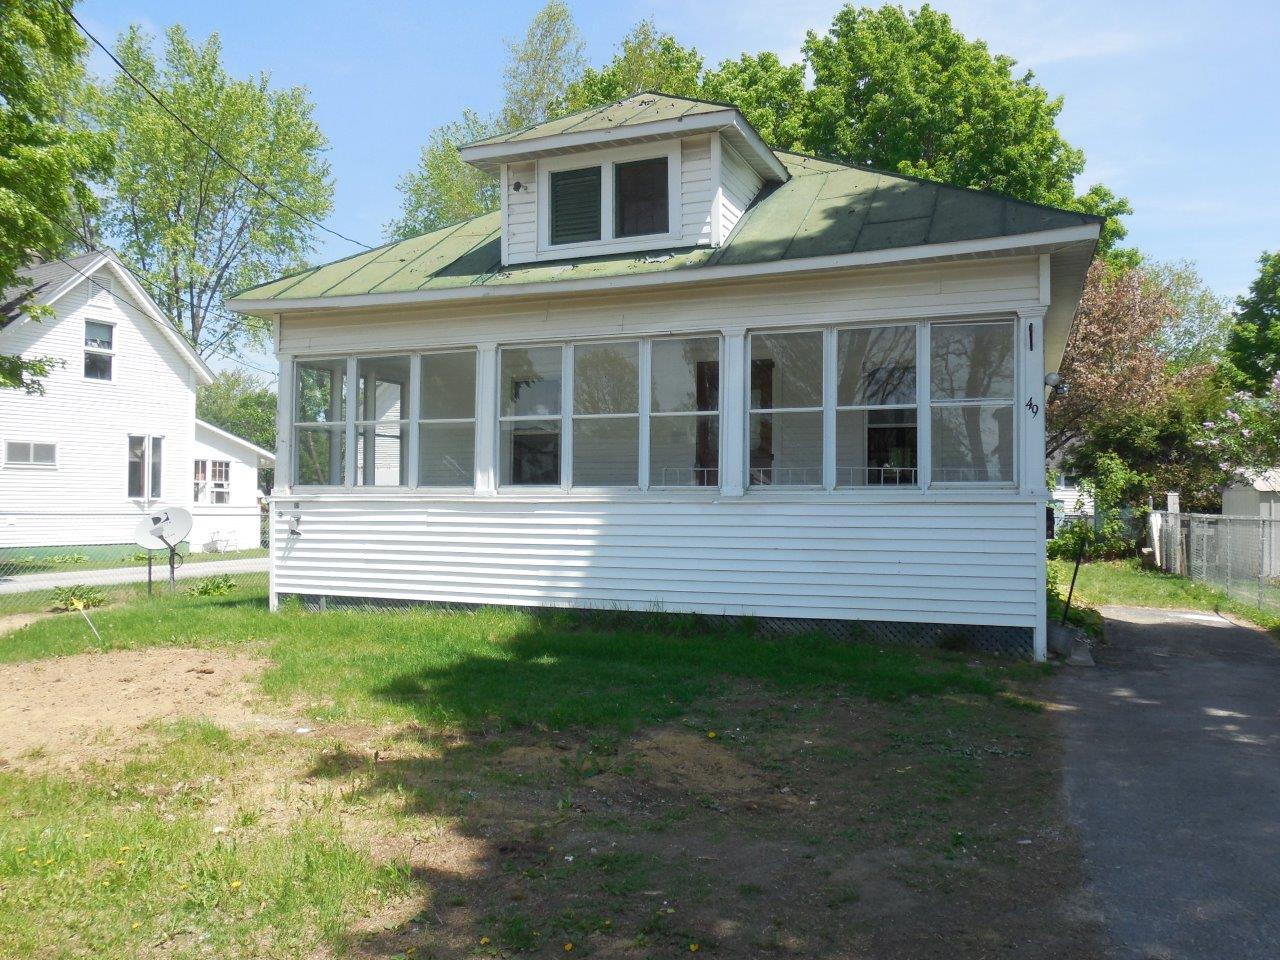 獨棟家庭住宅 為 出售 在 49 Greenwich St, Swanton Swanton, 佛蒙特州 05488 美國